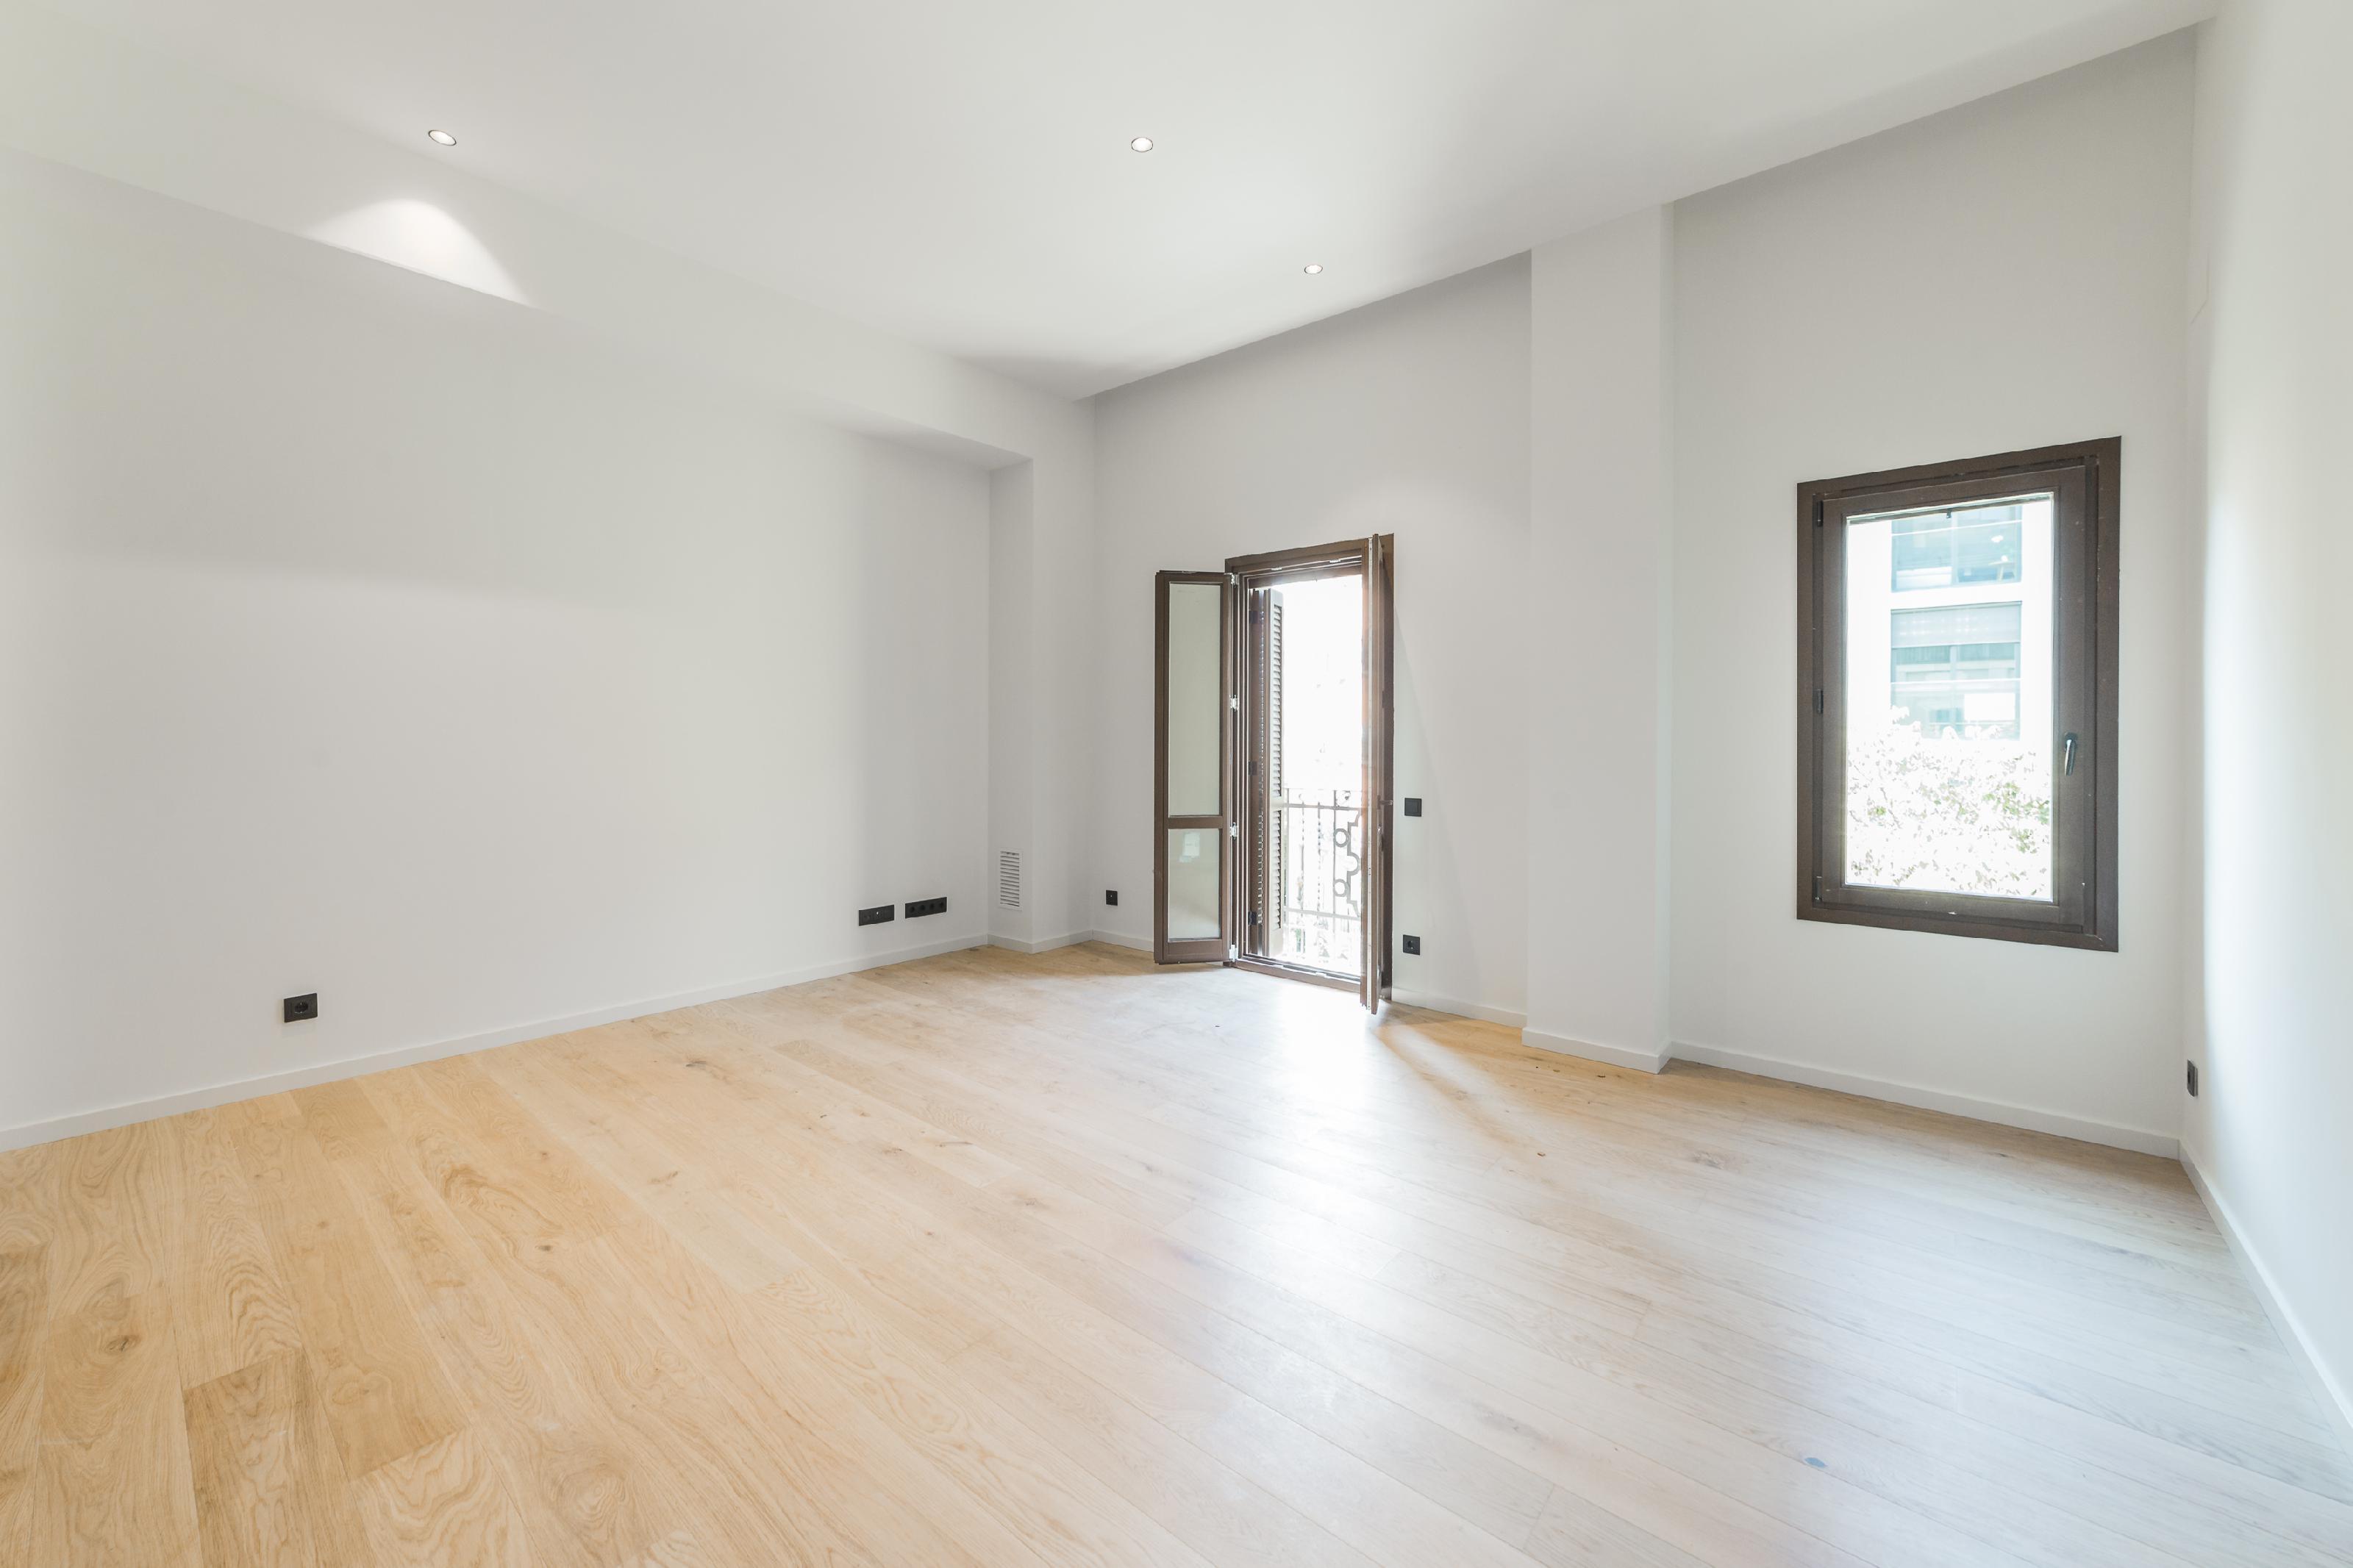 182456 Apartamento en venda en Eixample, Antiga Esquerre Eixample 9